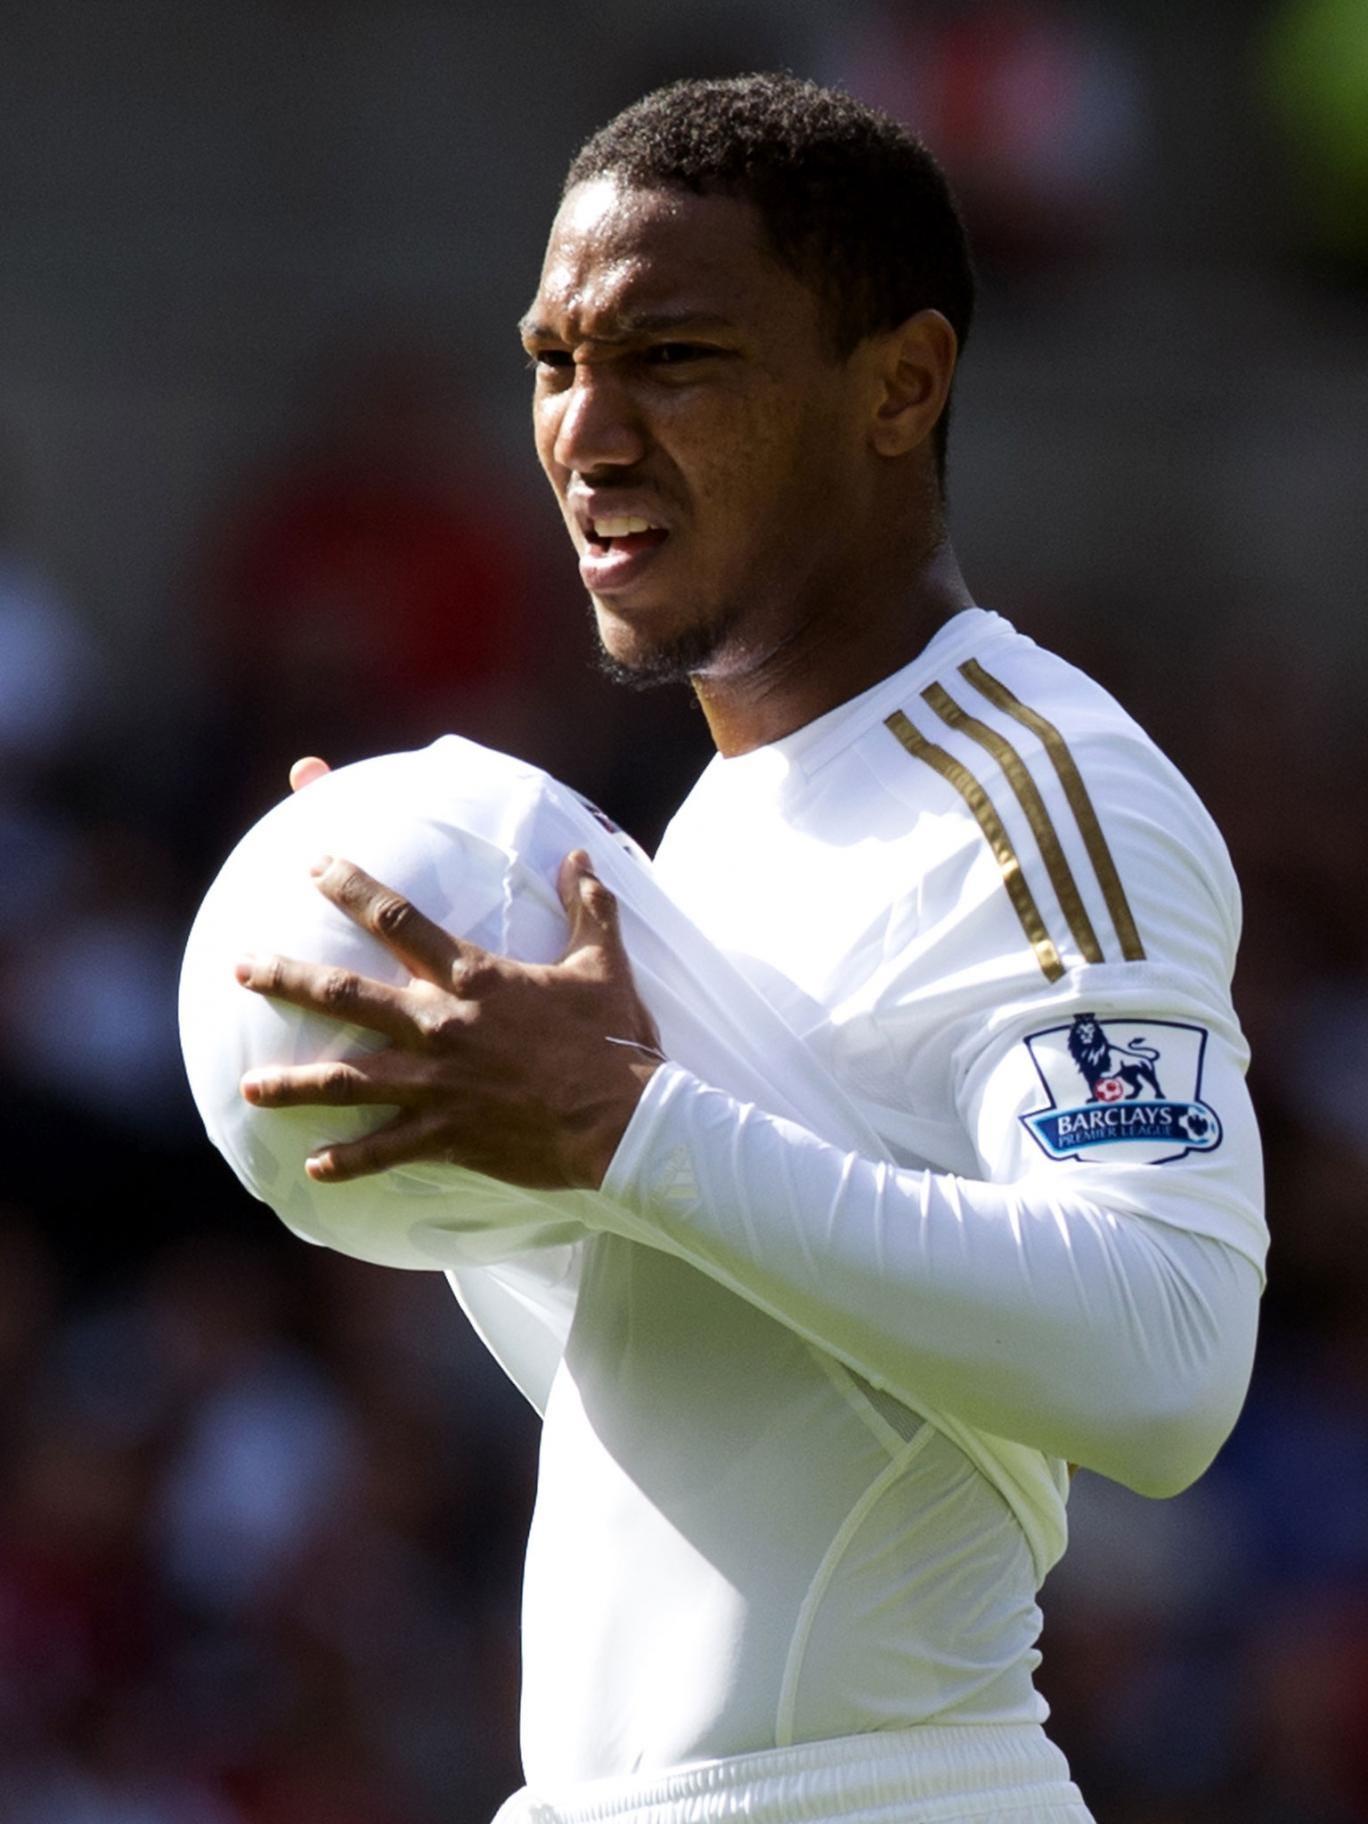 Swansea have re-signed Jonathan de Guzman on loan for next season